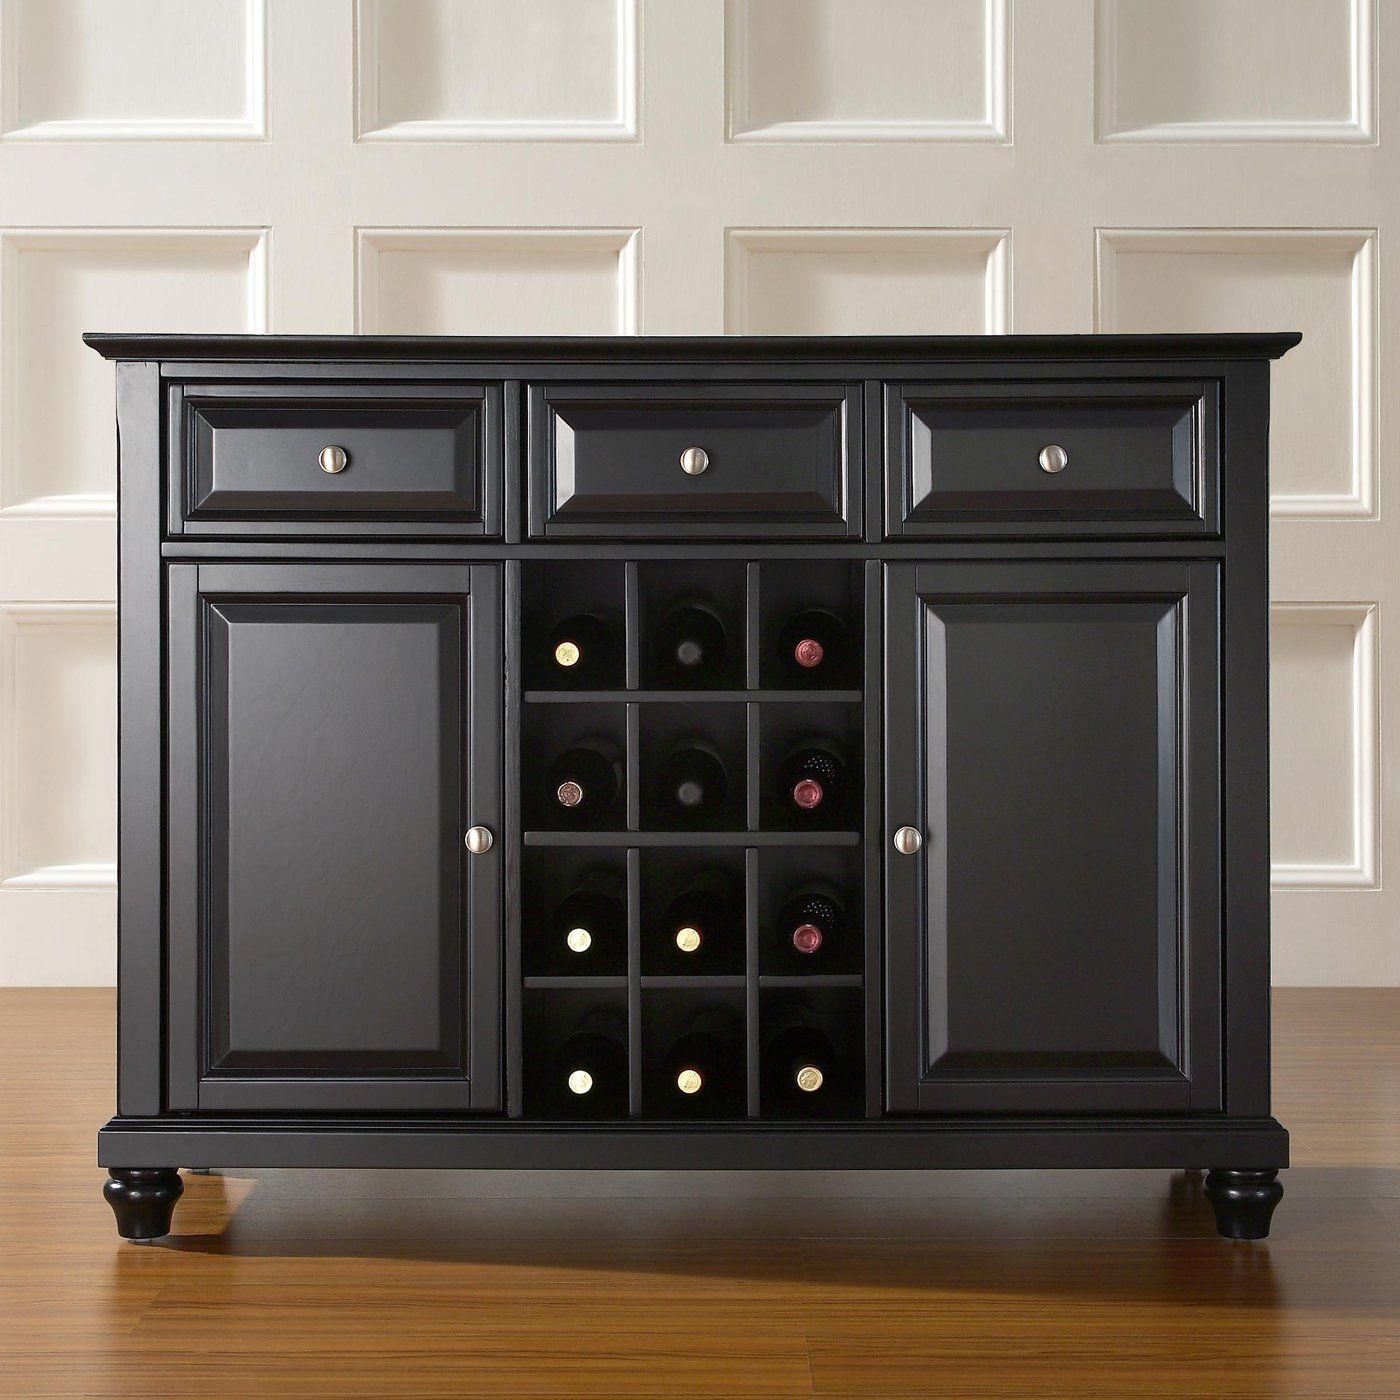 Crosley Furniture Buffet Server/Sideboard Cabinet